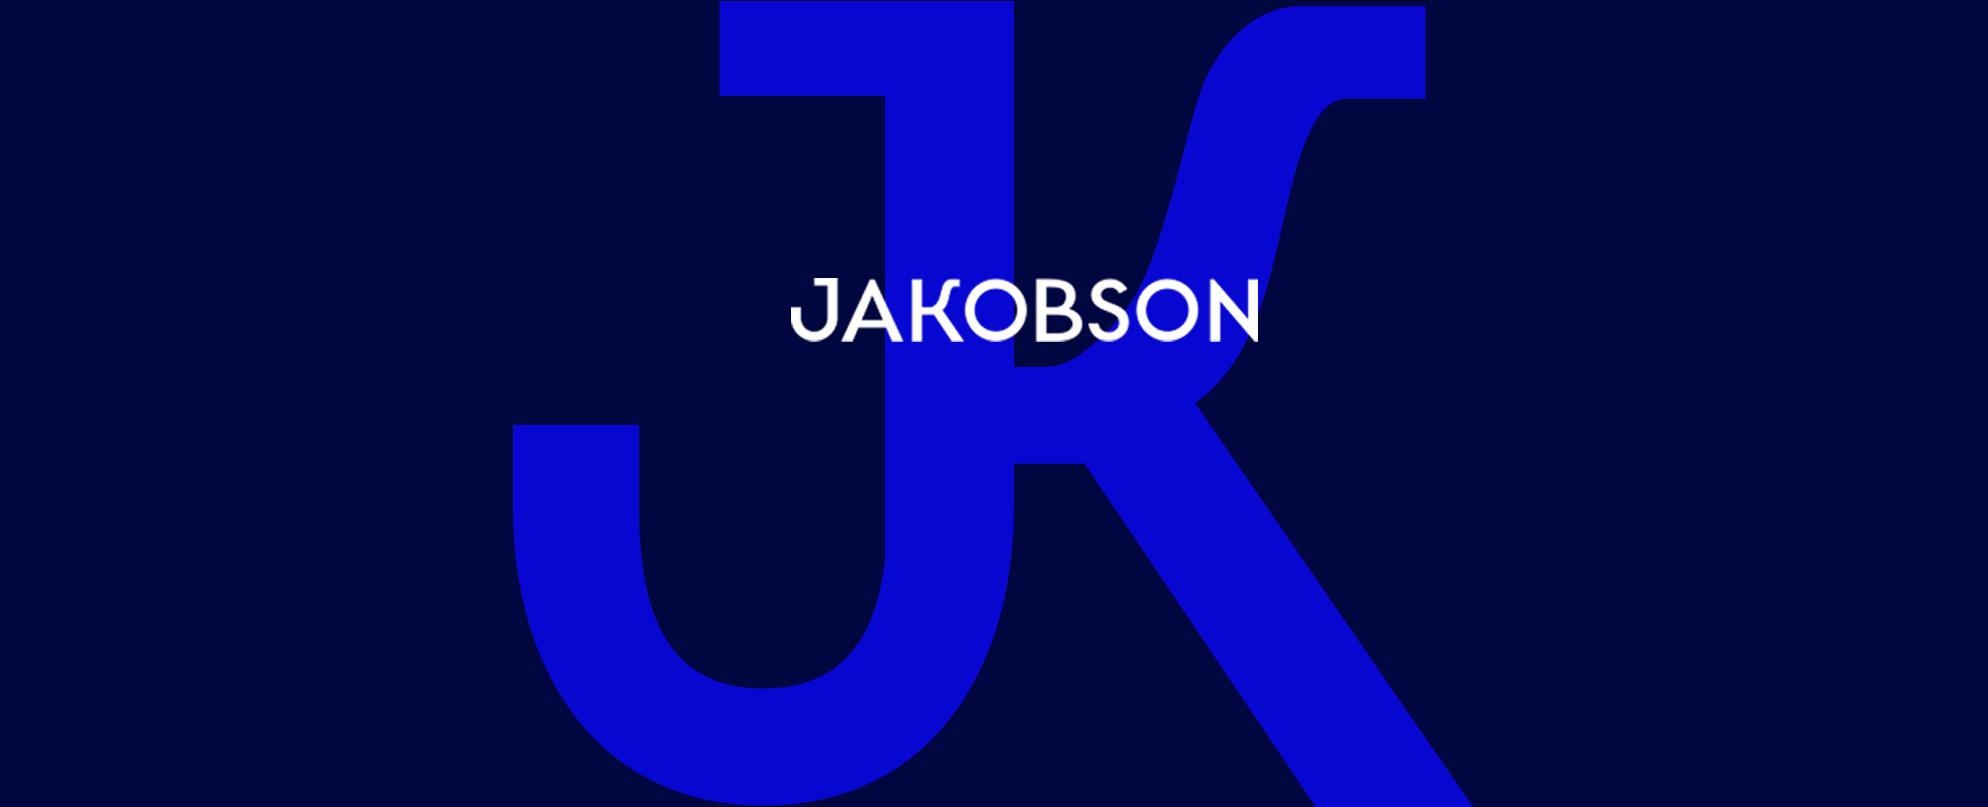 Jakobson Image